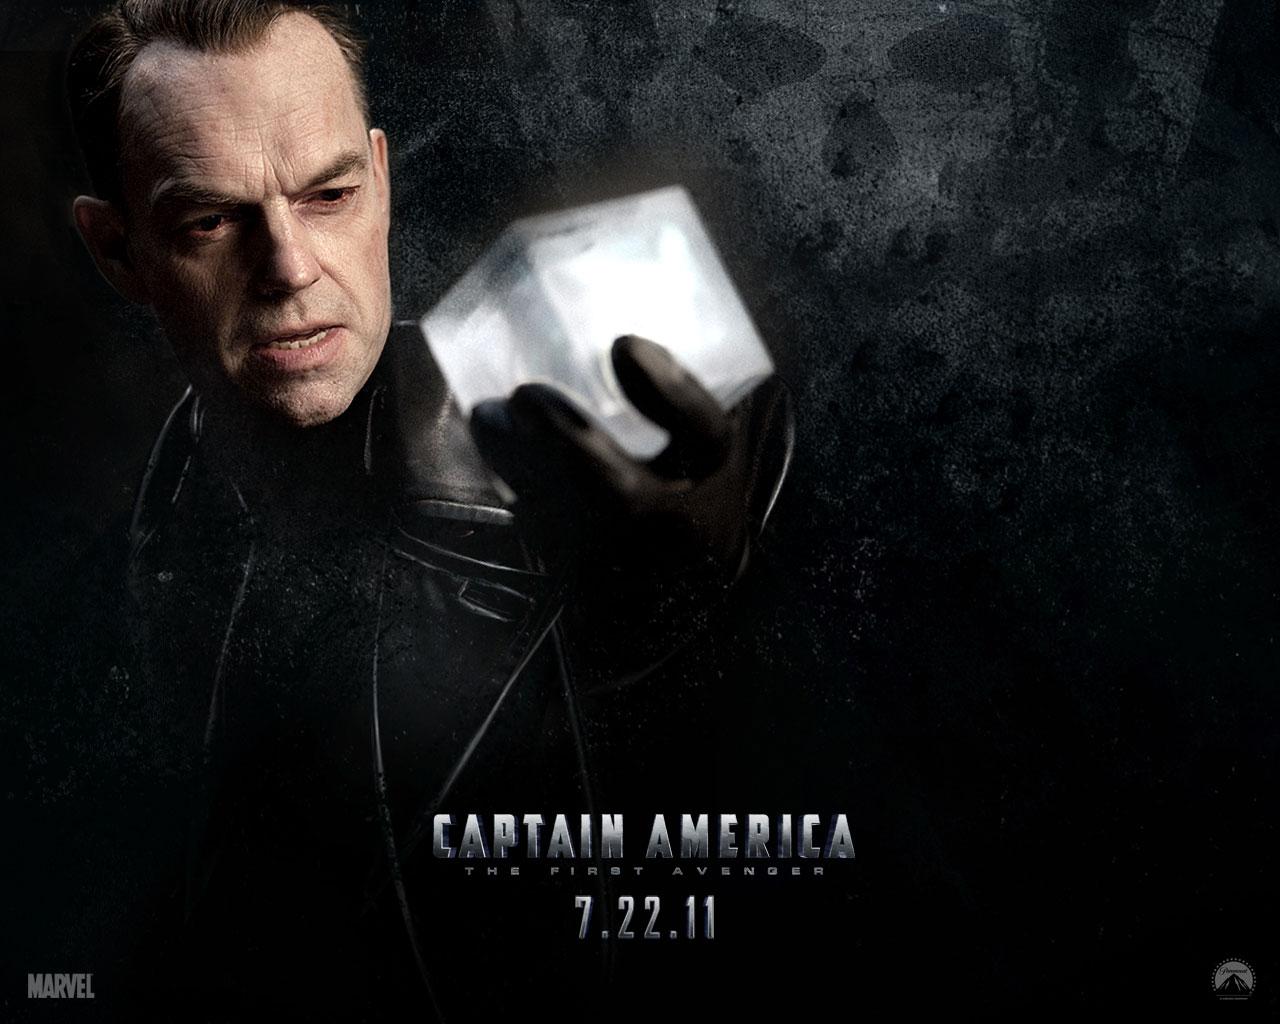 Captain America High Quality HD wallpaper